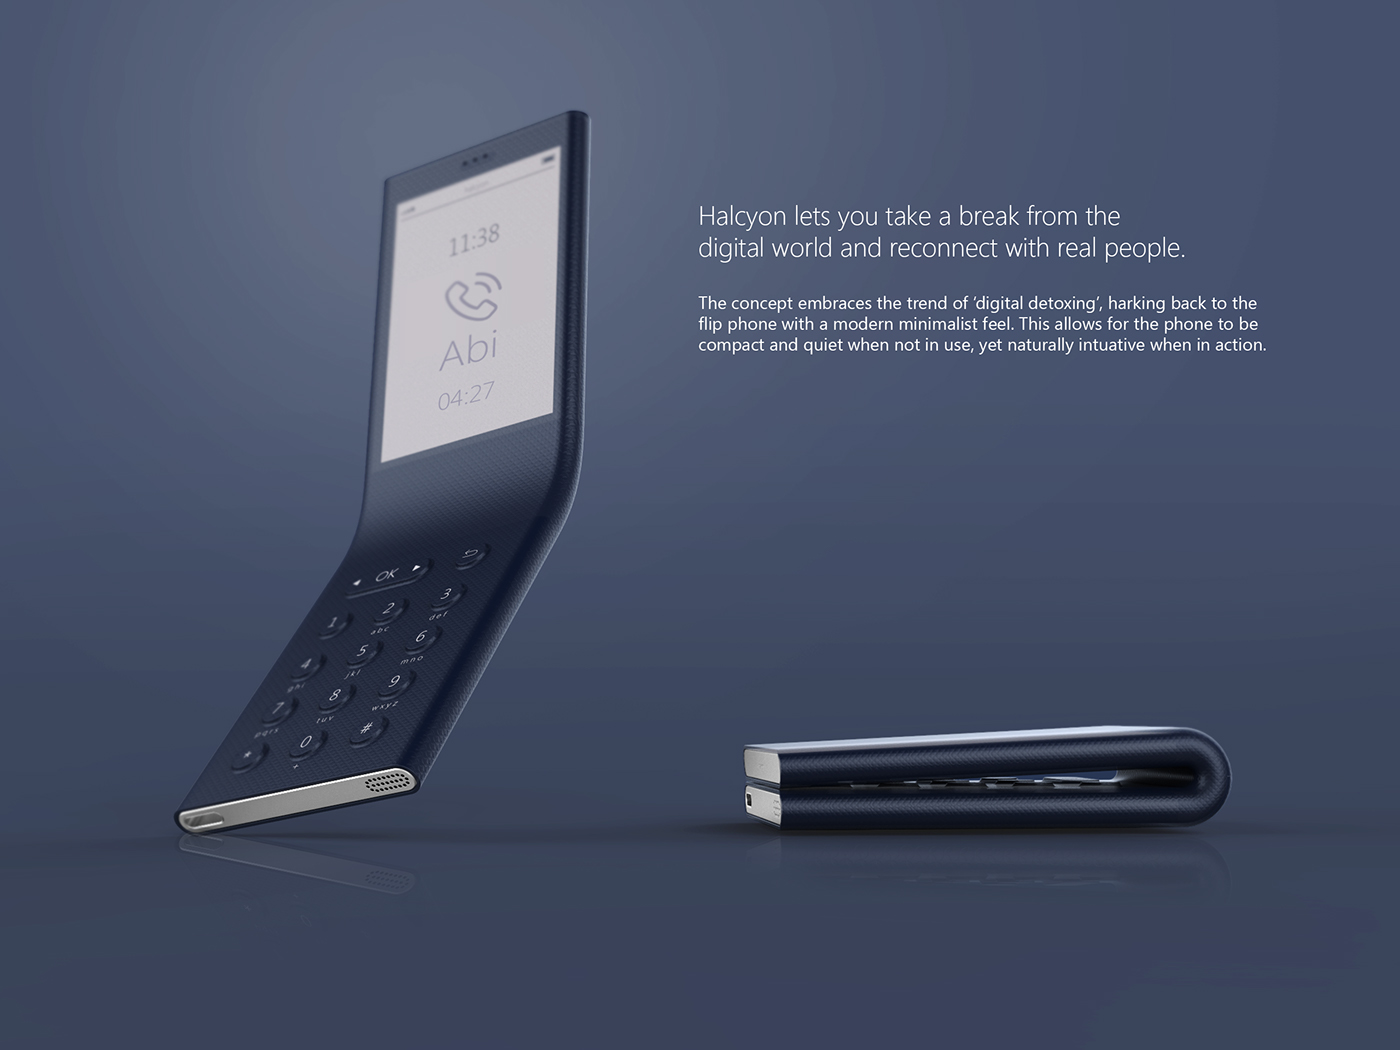 halcyon概念手机设计